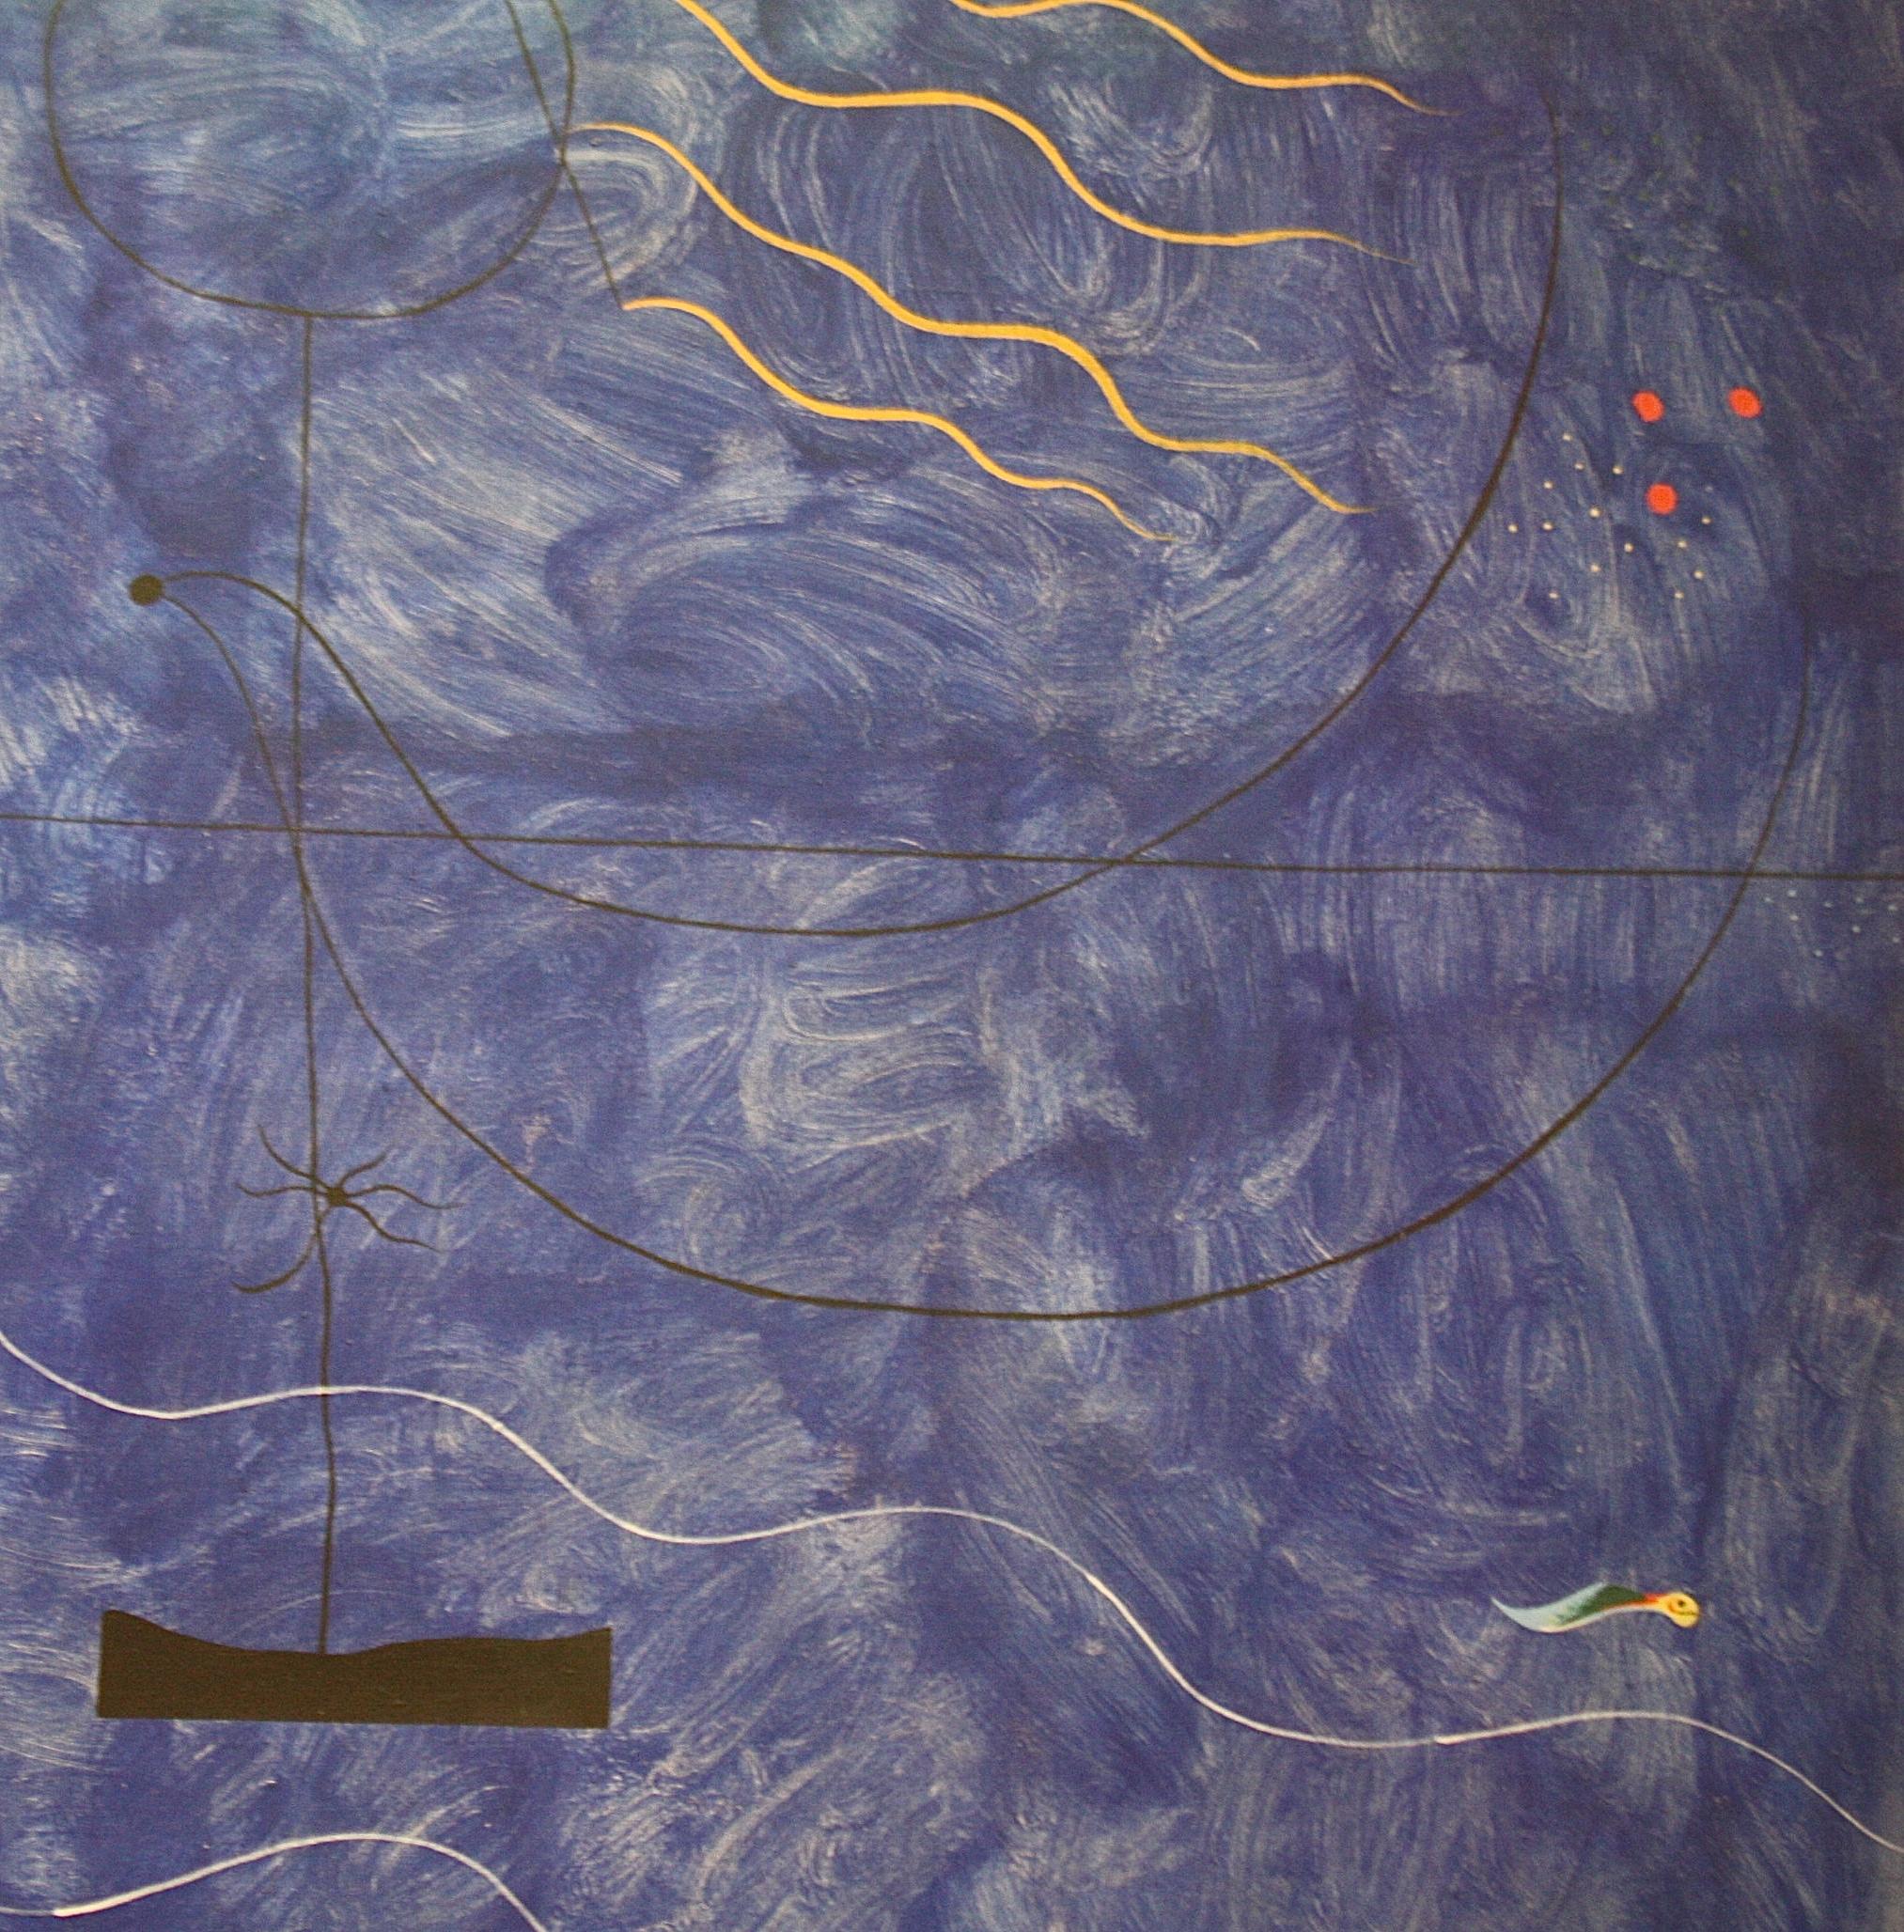 Joan Miro, 1924, détail, exposition leiris, centre pompidou-metz